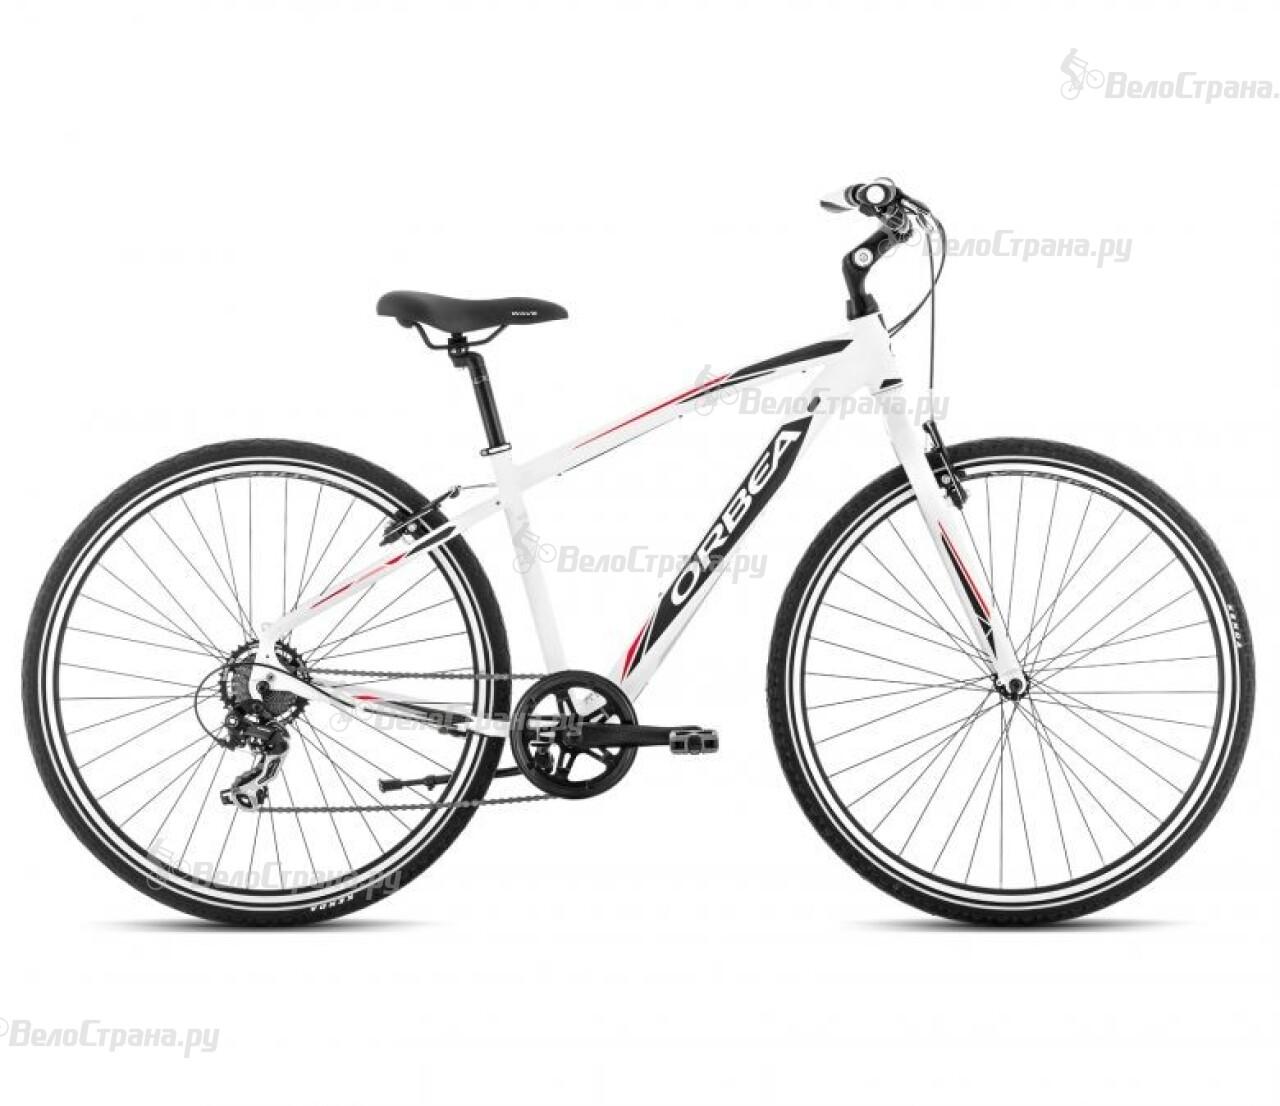 Велосипед Orbea Comfort 28 40 14 (2014)